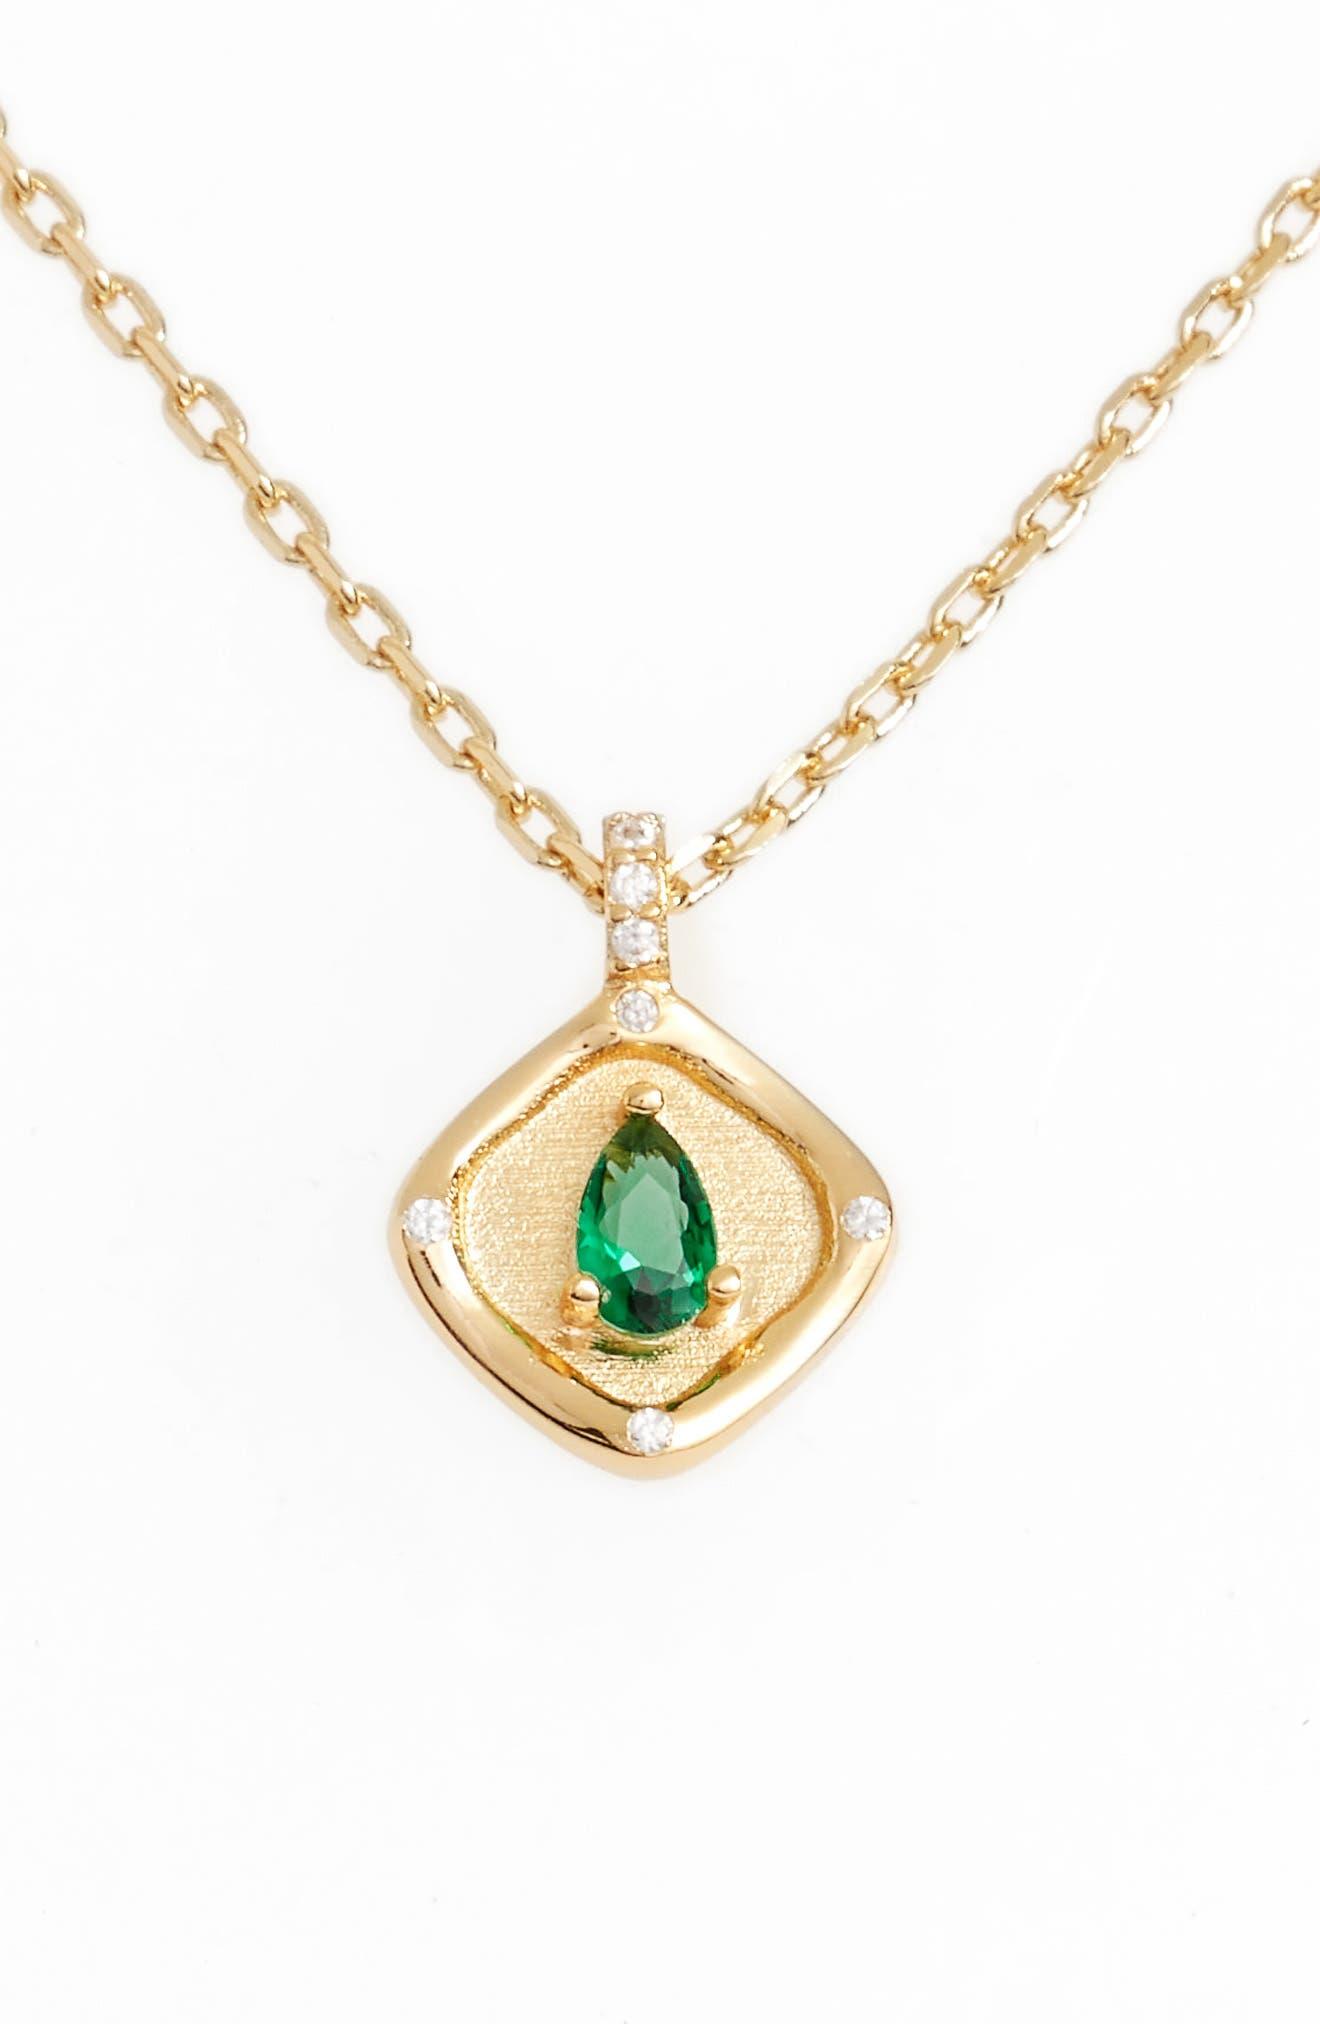 Teardrop Monthstone Pendant Necklace,                             Main thumbnail 1, color,                             300